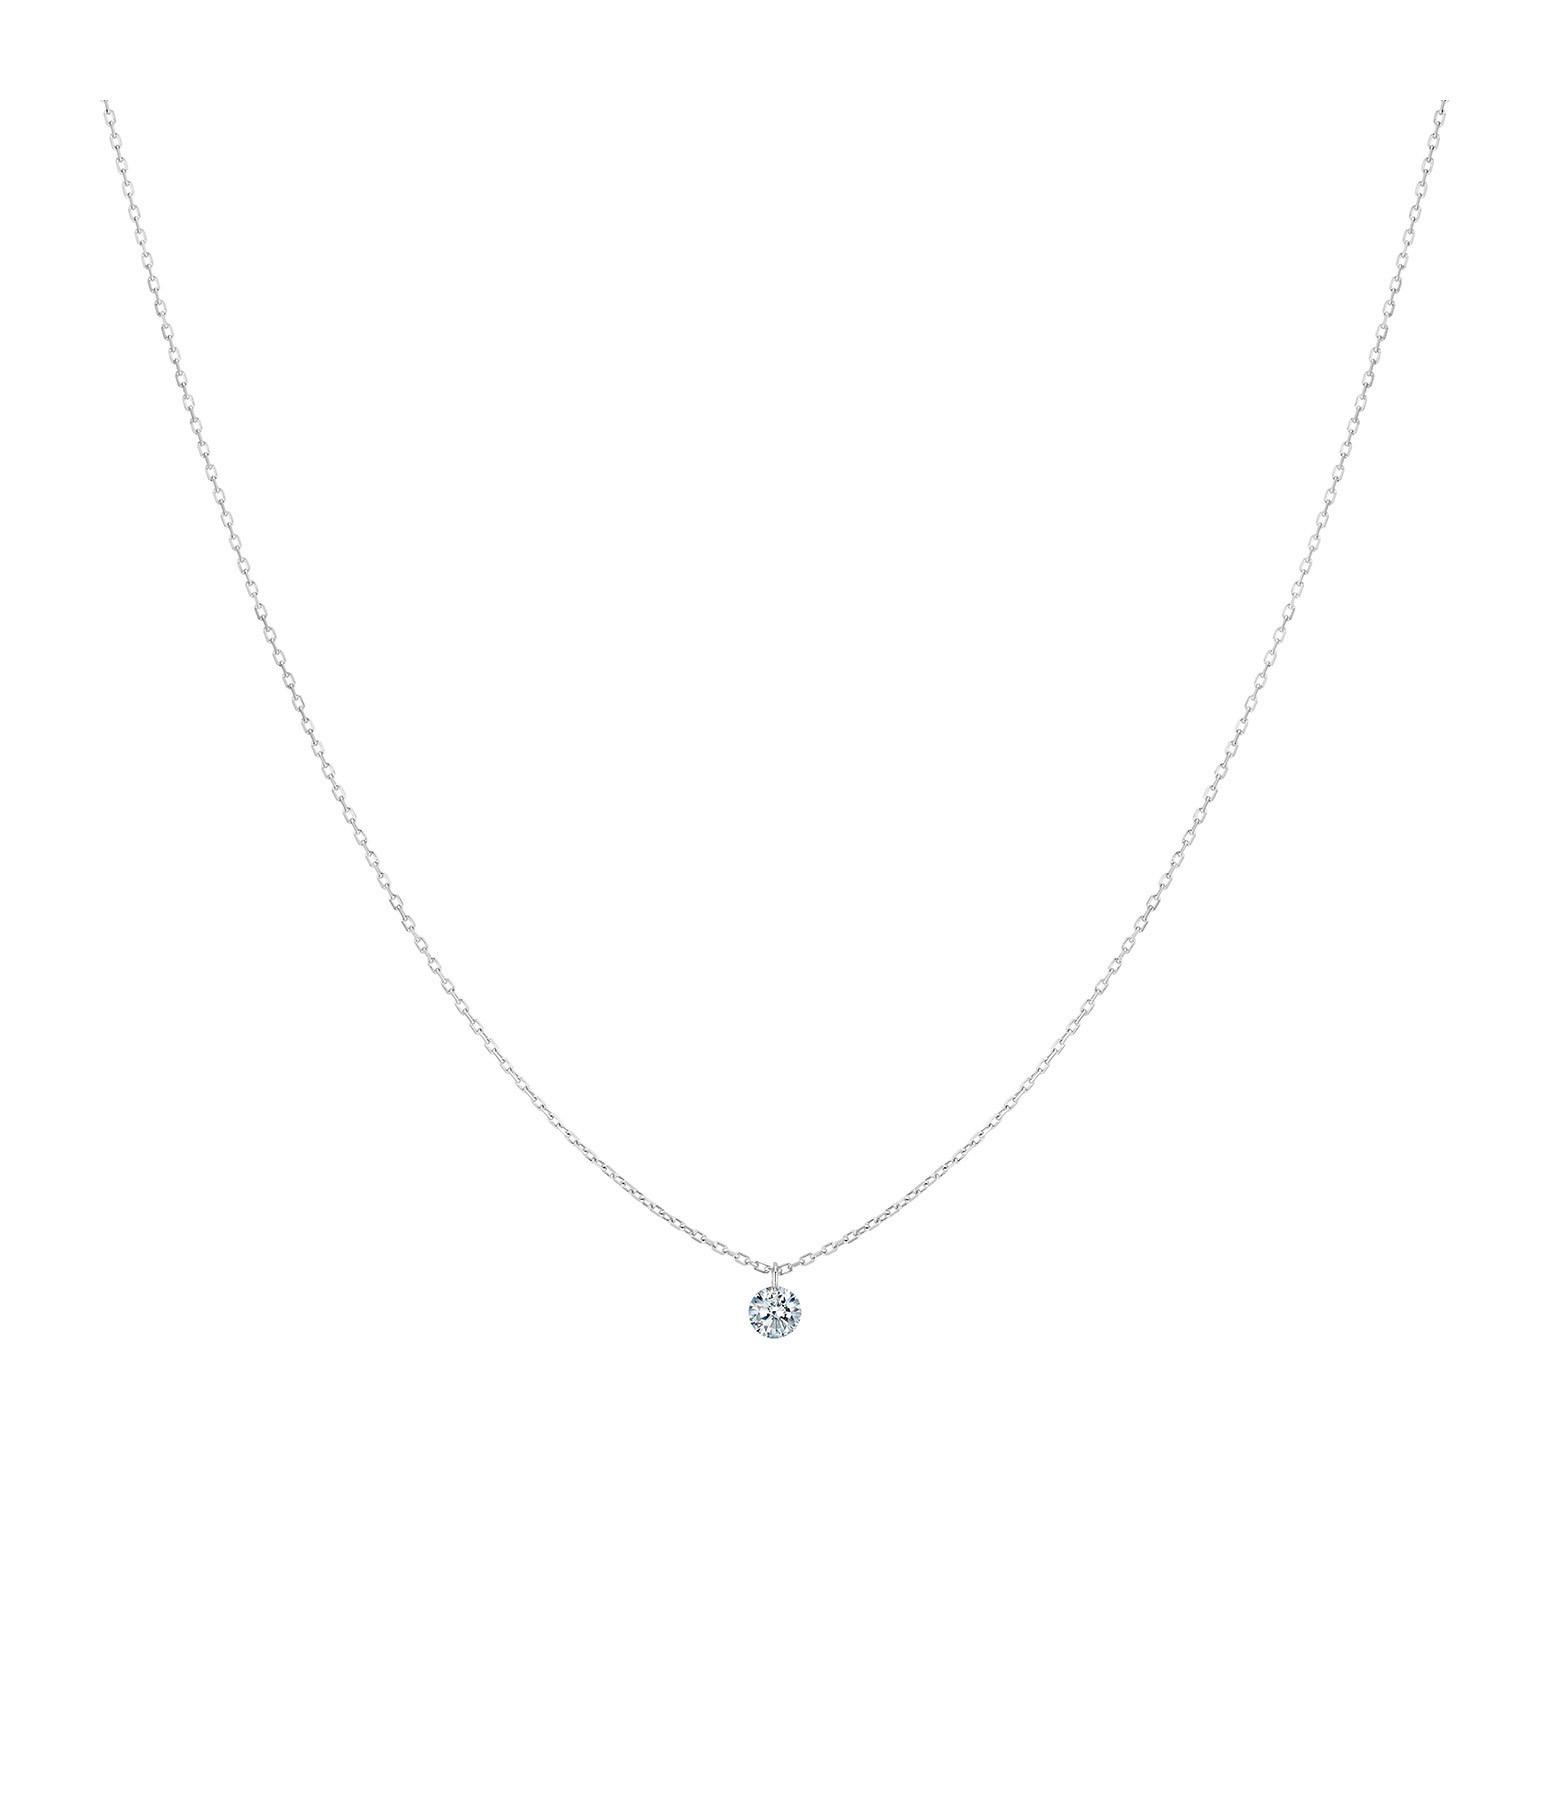 LA BRUNE & LA BLONDE - Collier 360° Diamant Brillant 0,10 Or Blanc